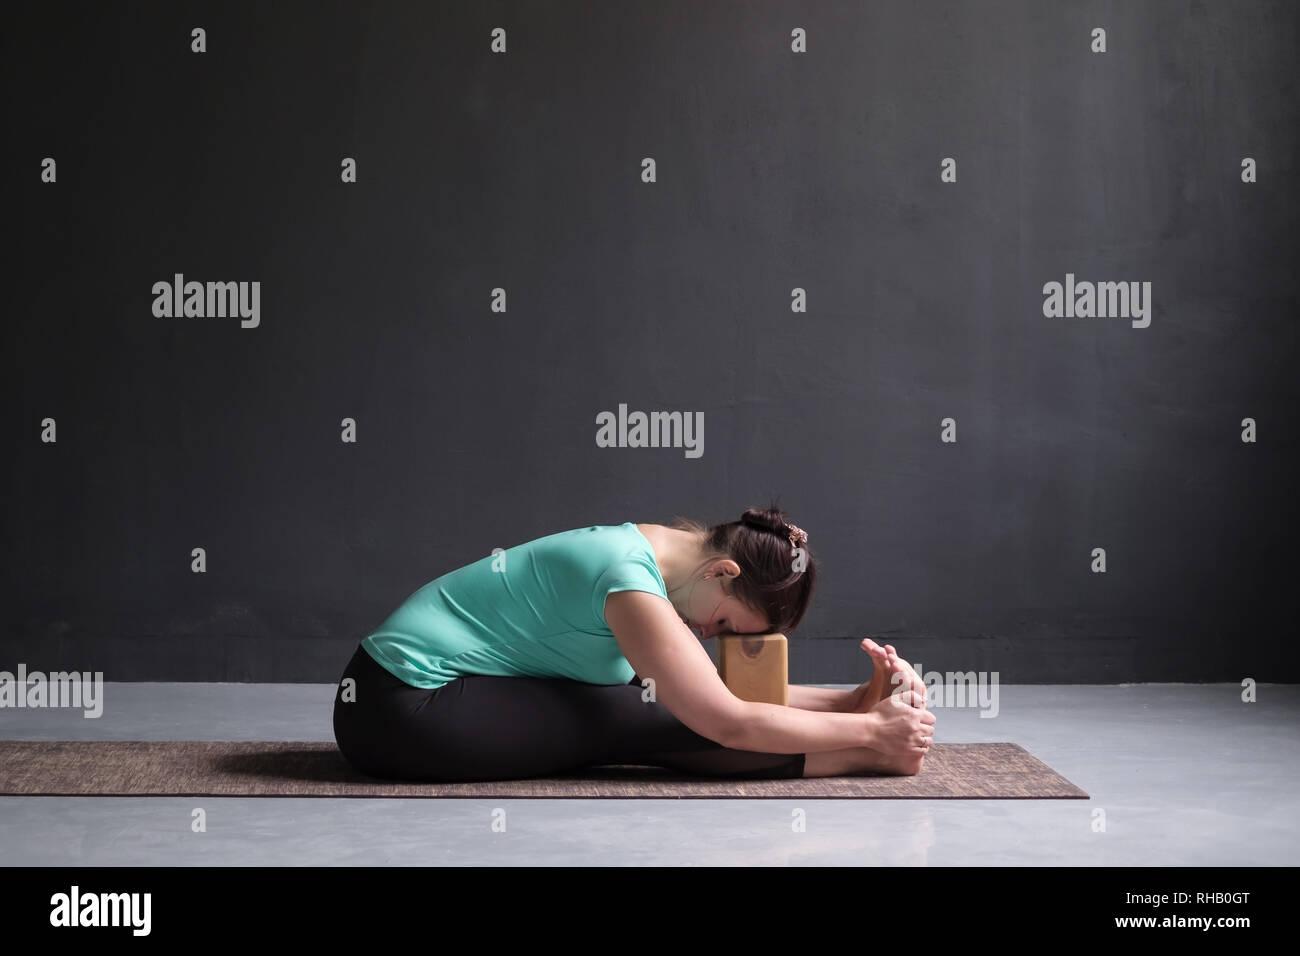 woman practicing yoga, Seated forward bend pose, using brick or block - Stock Image